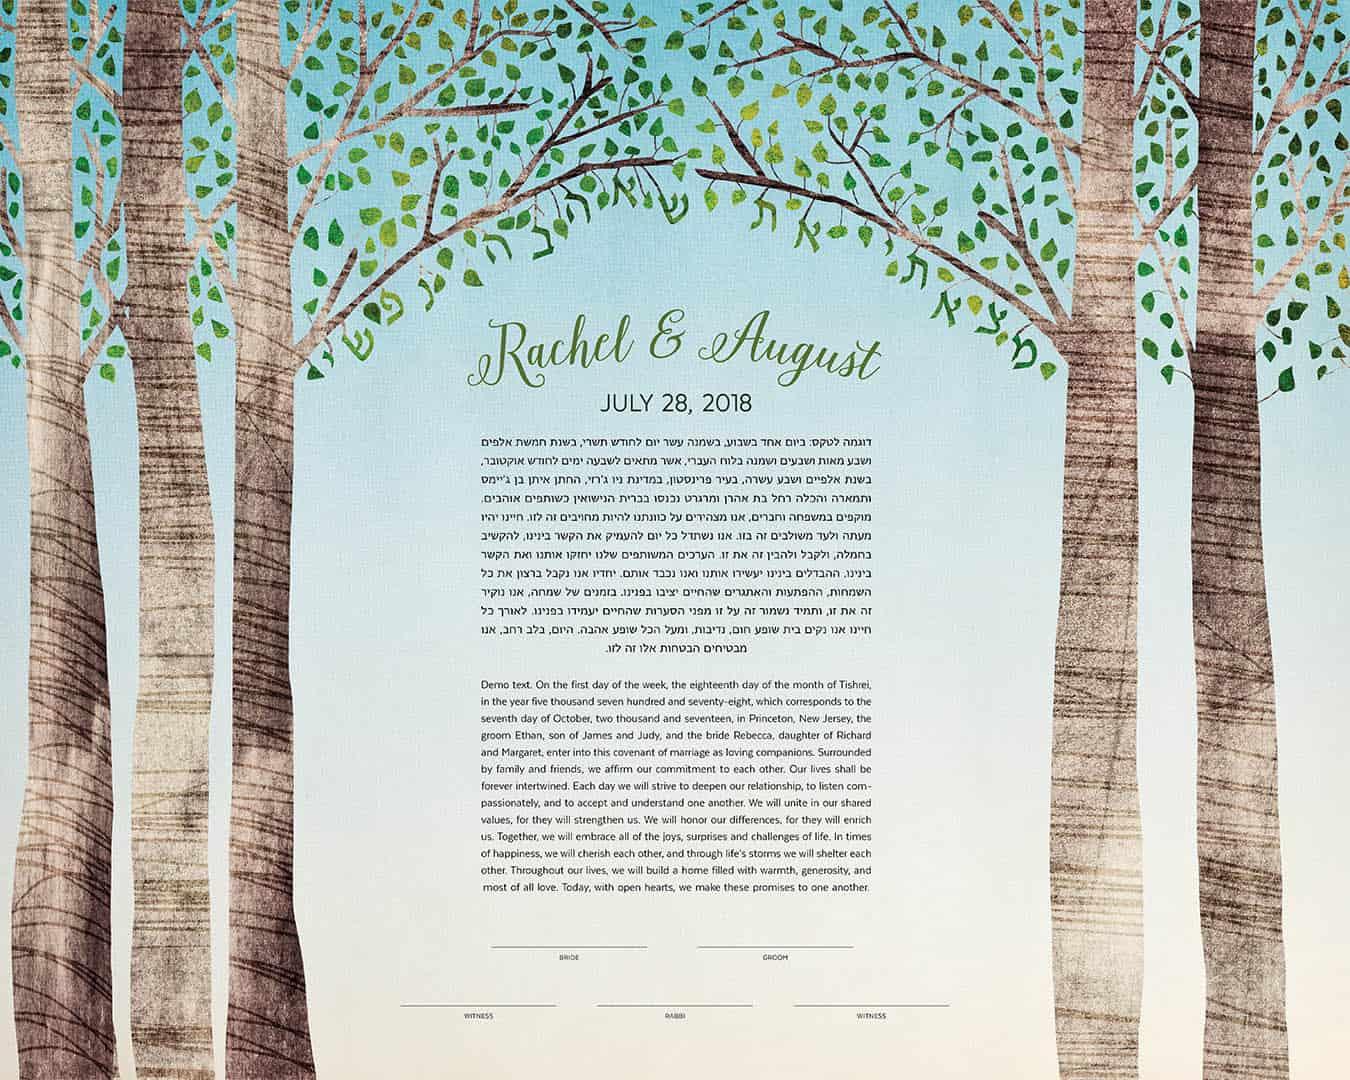 Birch tree ketubah summer illustration whimsical secret message